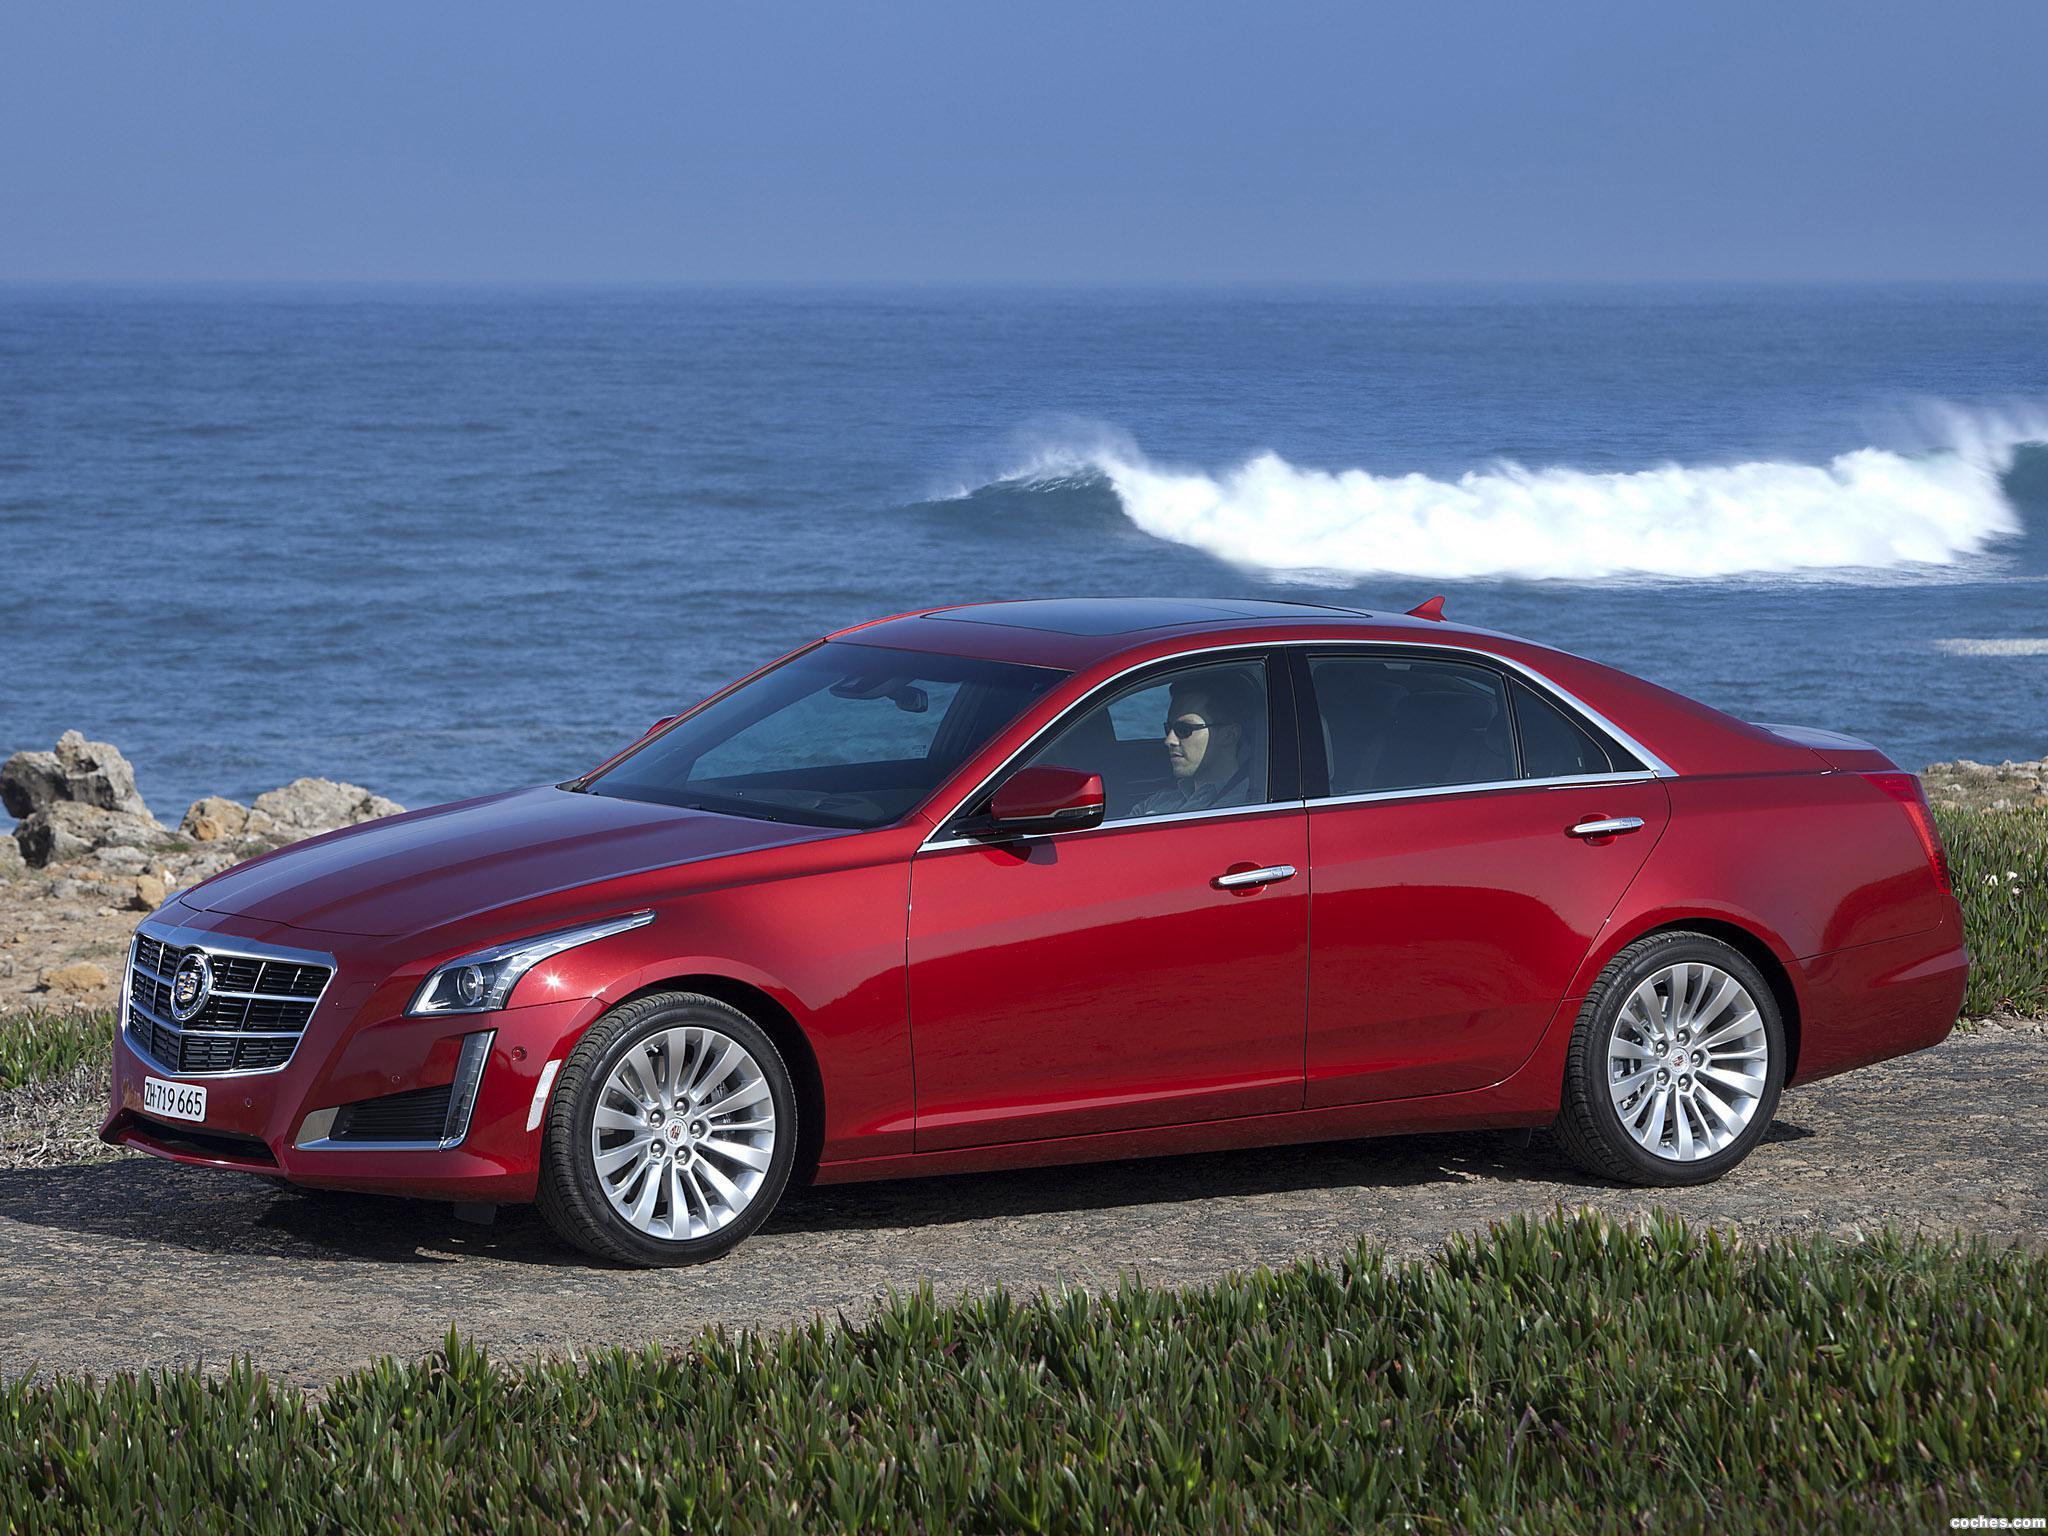 Foto 3 de Cadillac CTS Europe 2014